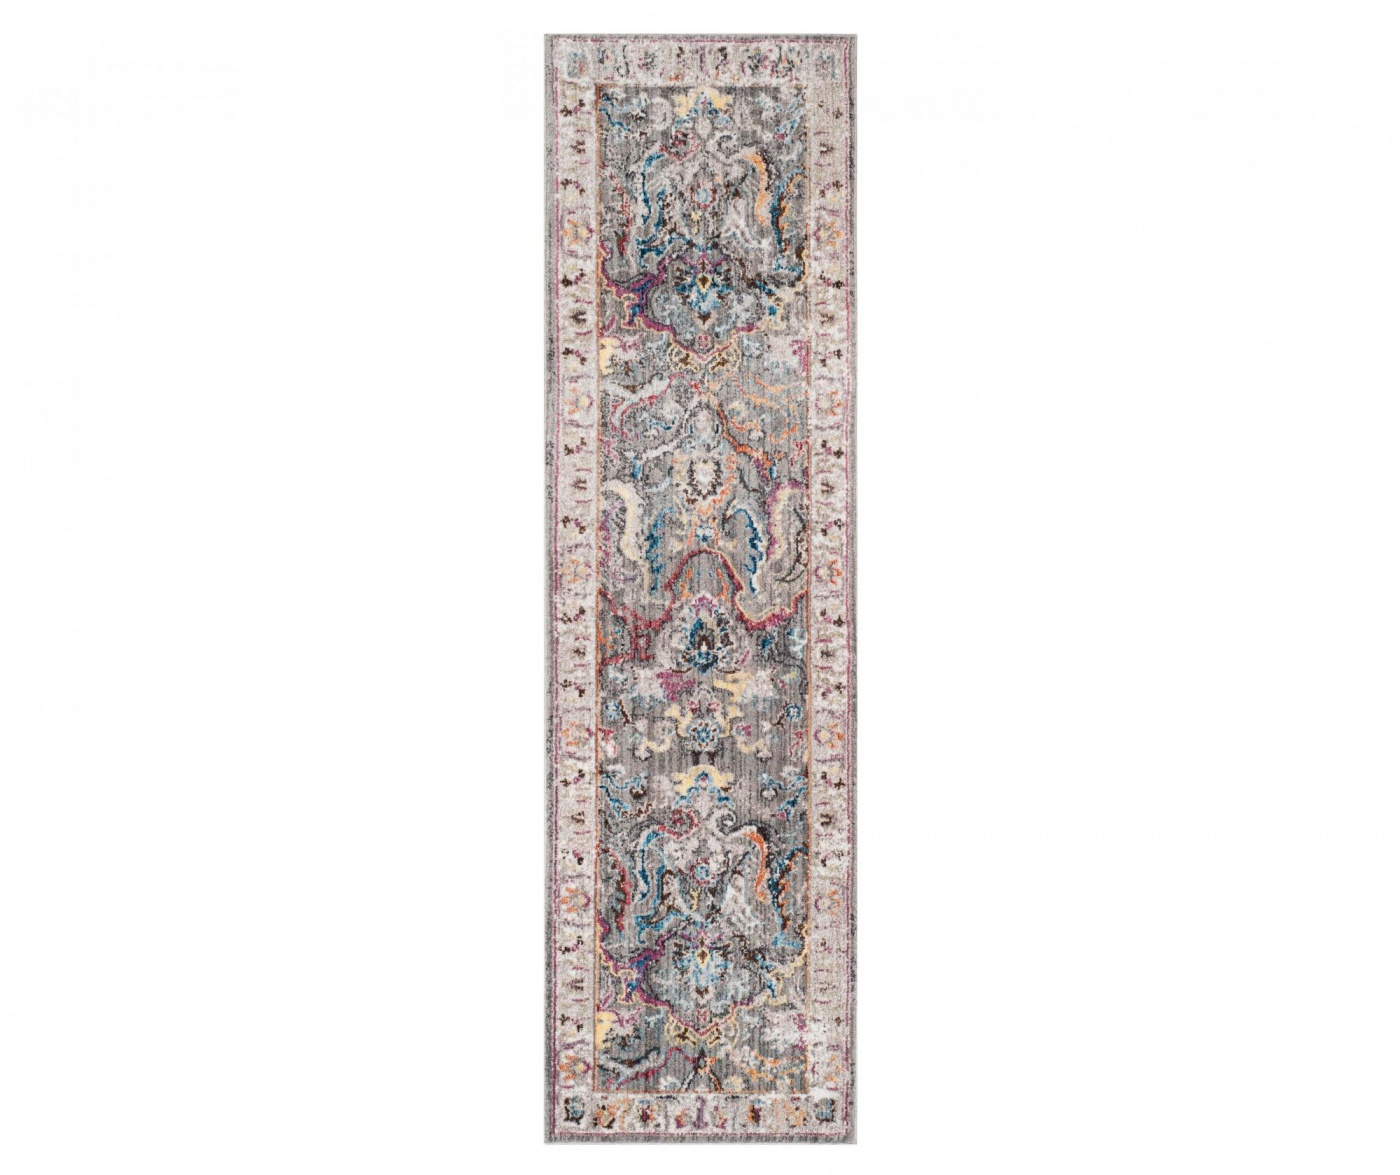 Tepih Myra Grey and Ivory 62x240 cm